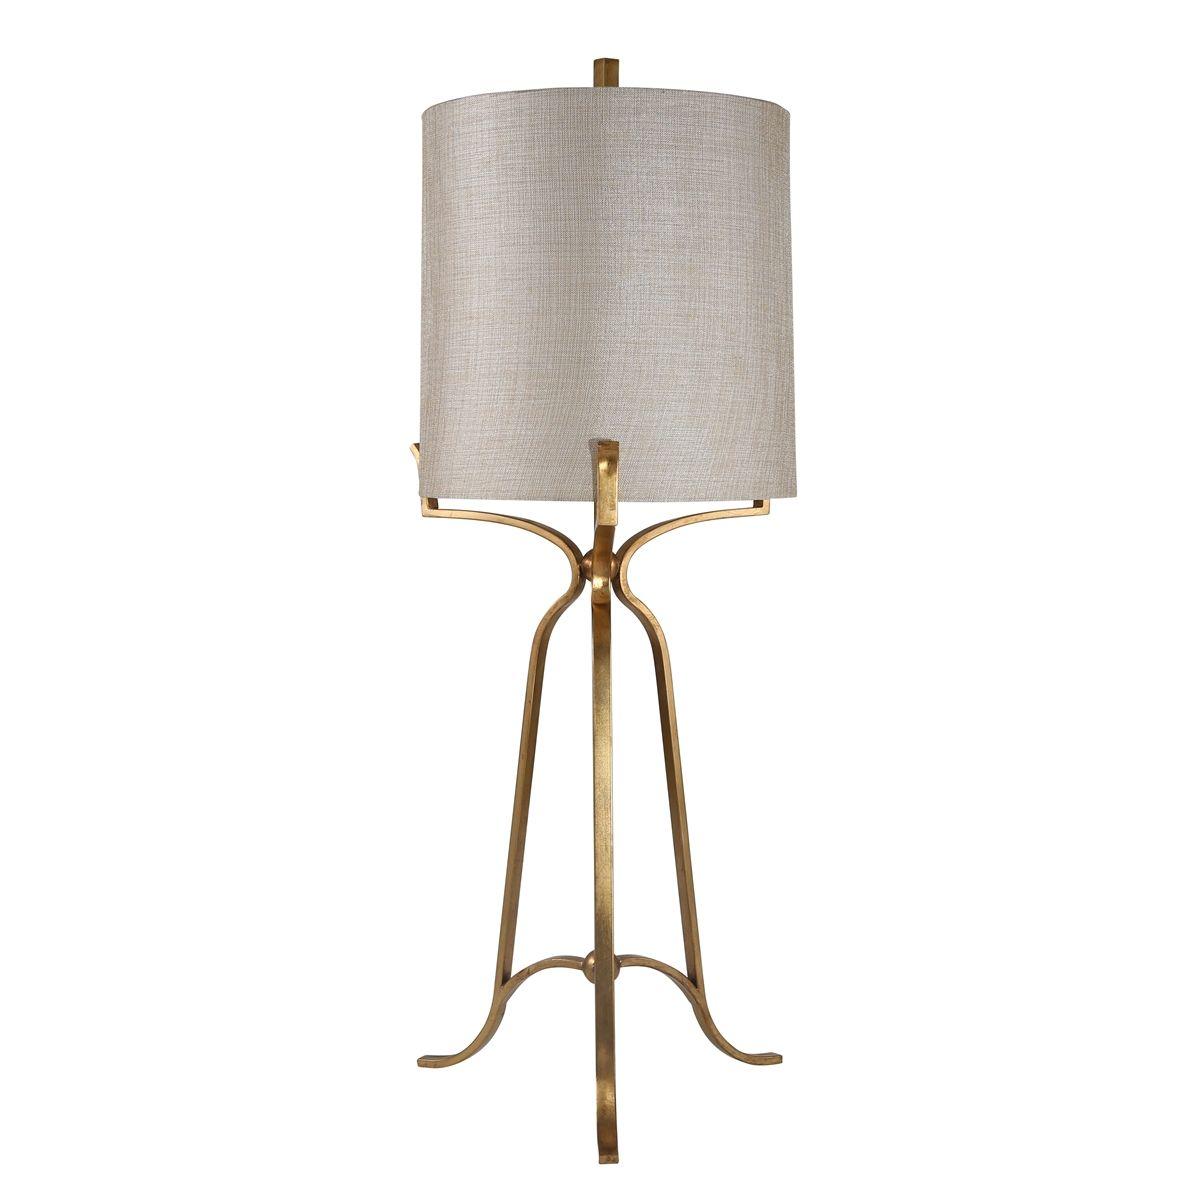 "METAL TRIPOD TABLE LAMP W/LIGHT GOLD SHADE, 43"", GOLD"